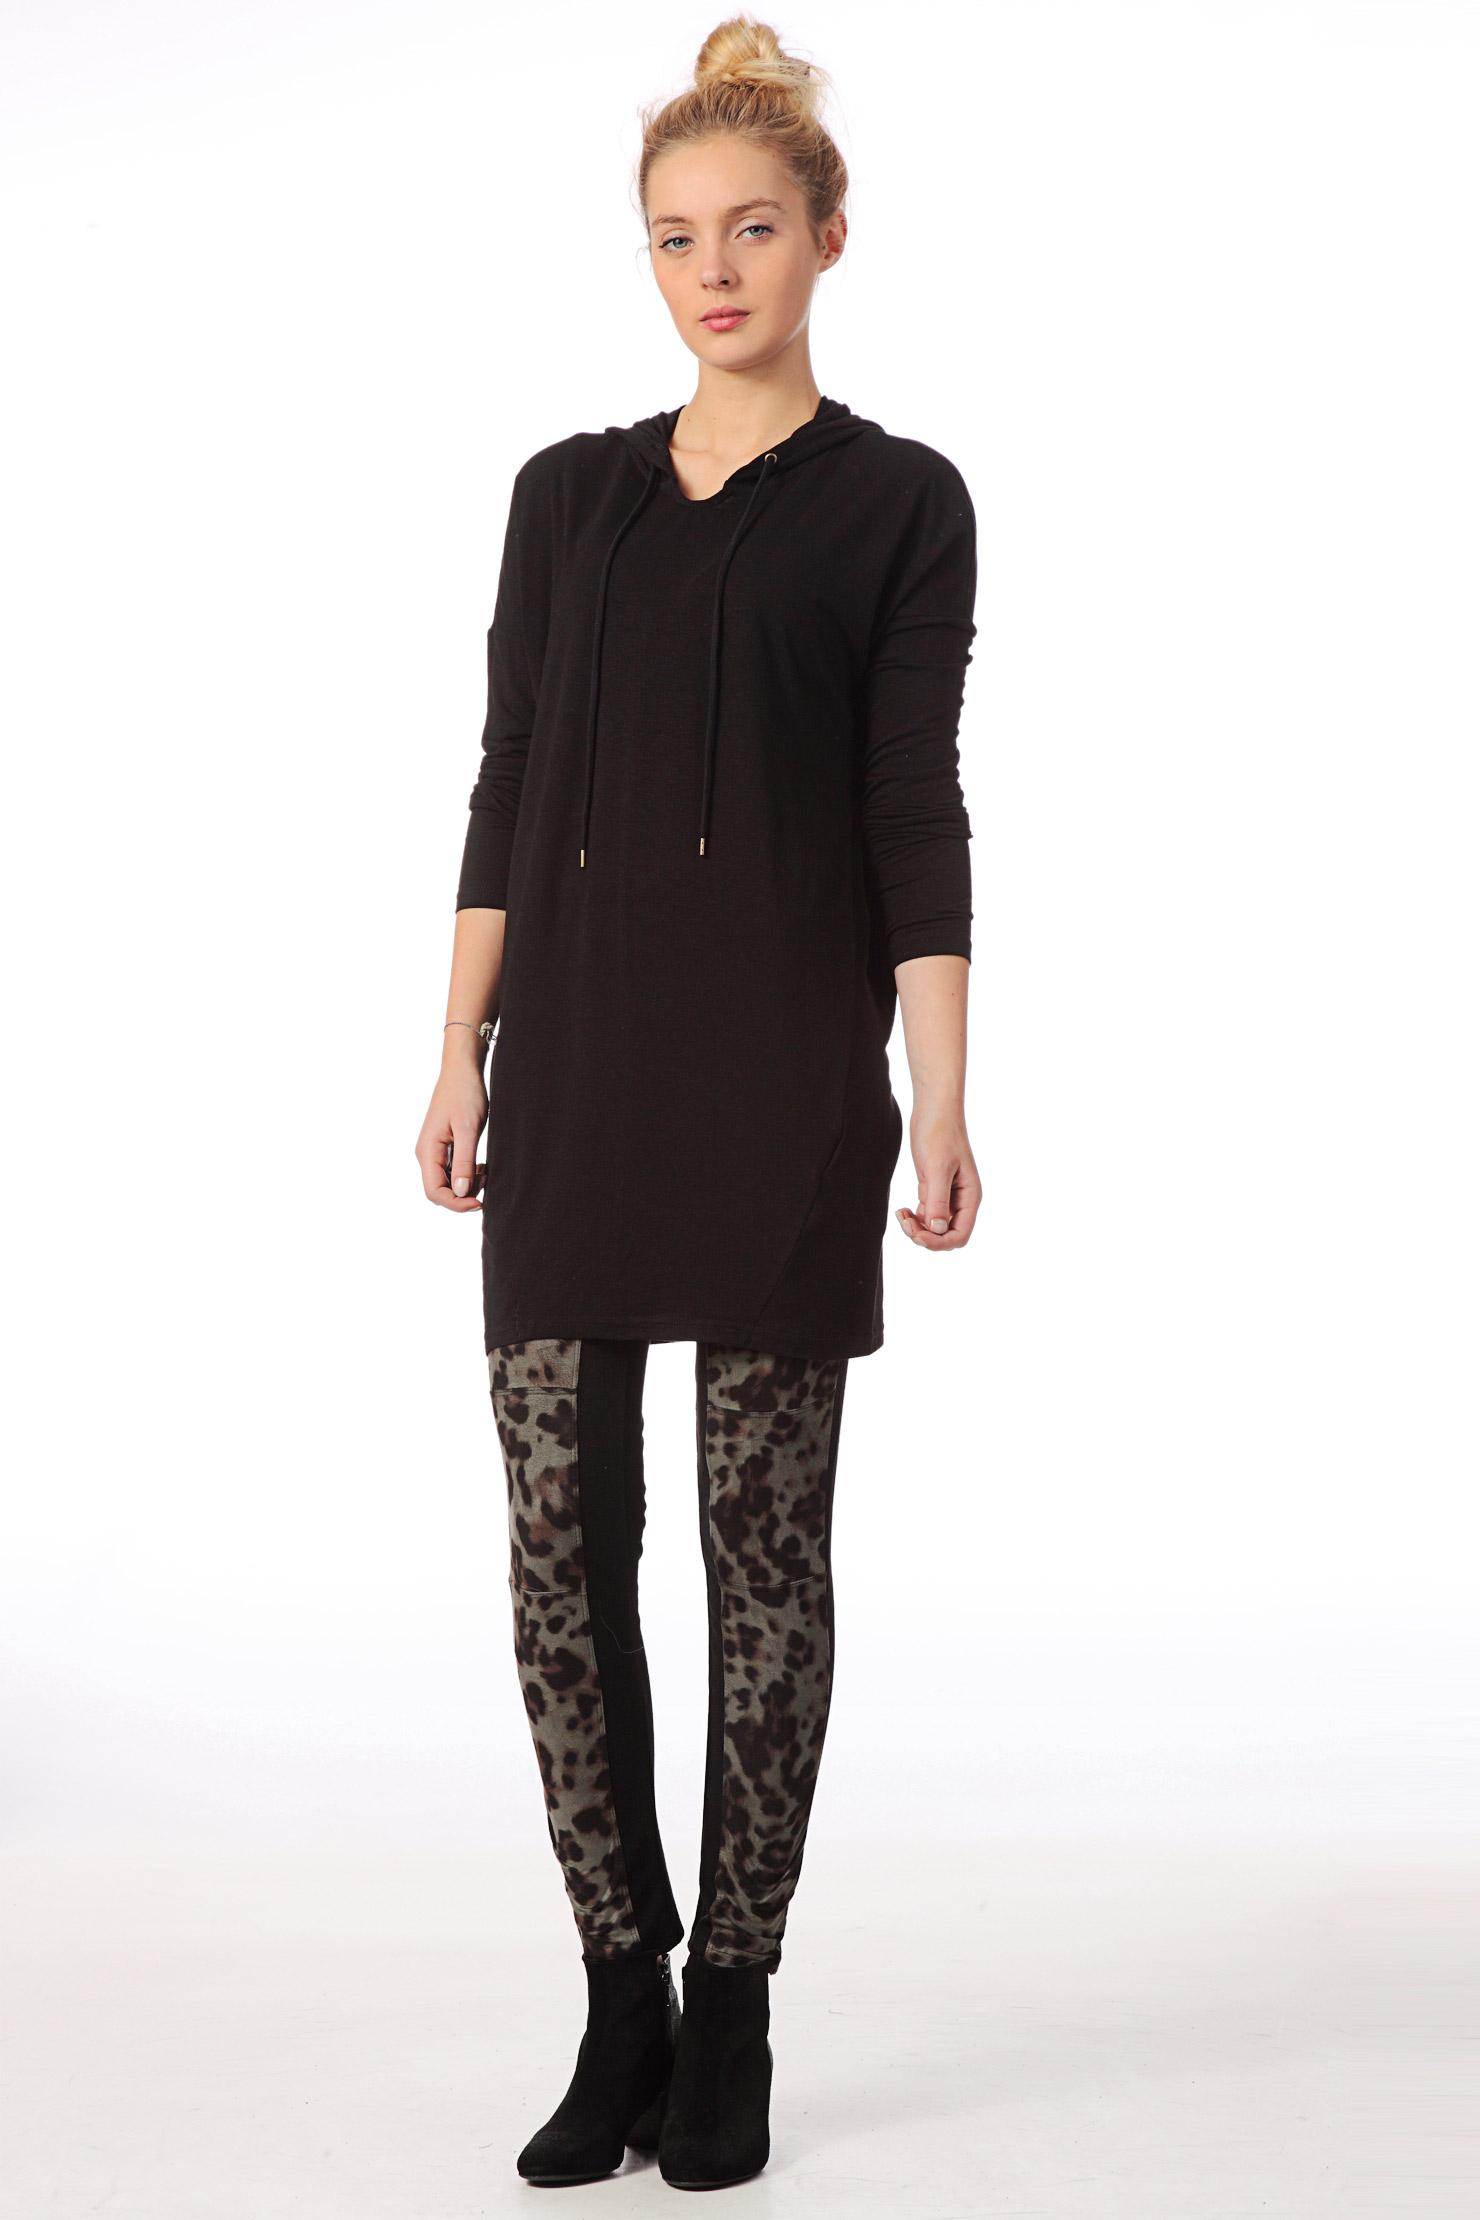 vero moda long sleeve top in black lyst. Black Bedroom Furniture Sets. Home Design Ideas